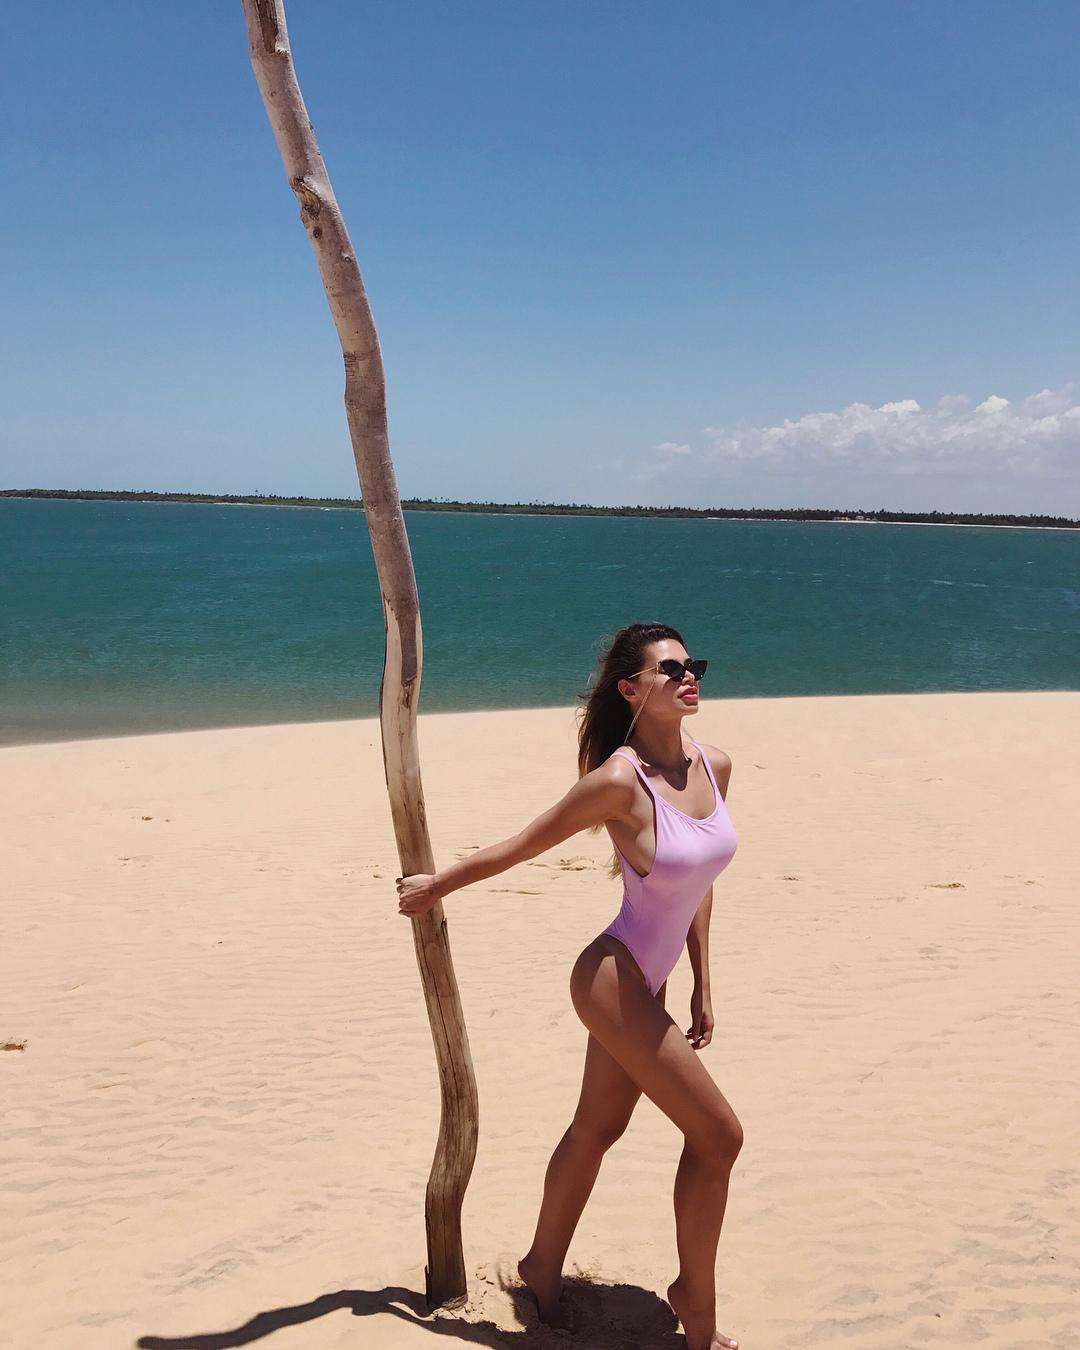 fernanda recht, miss brasil internacional 2018. Mrccqb10